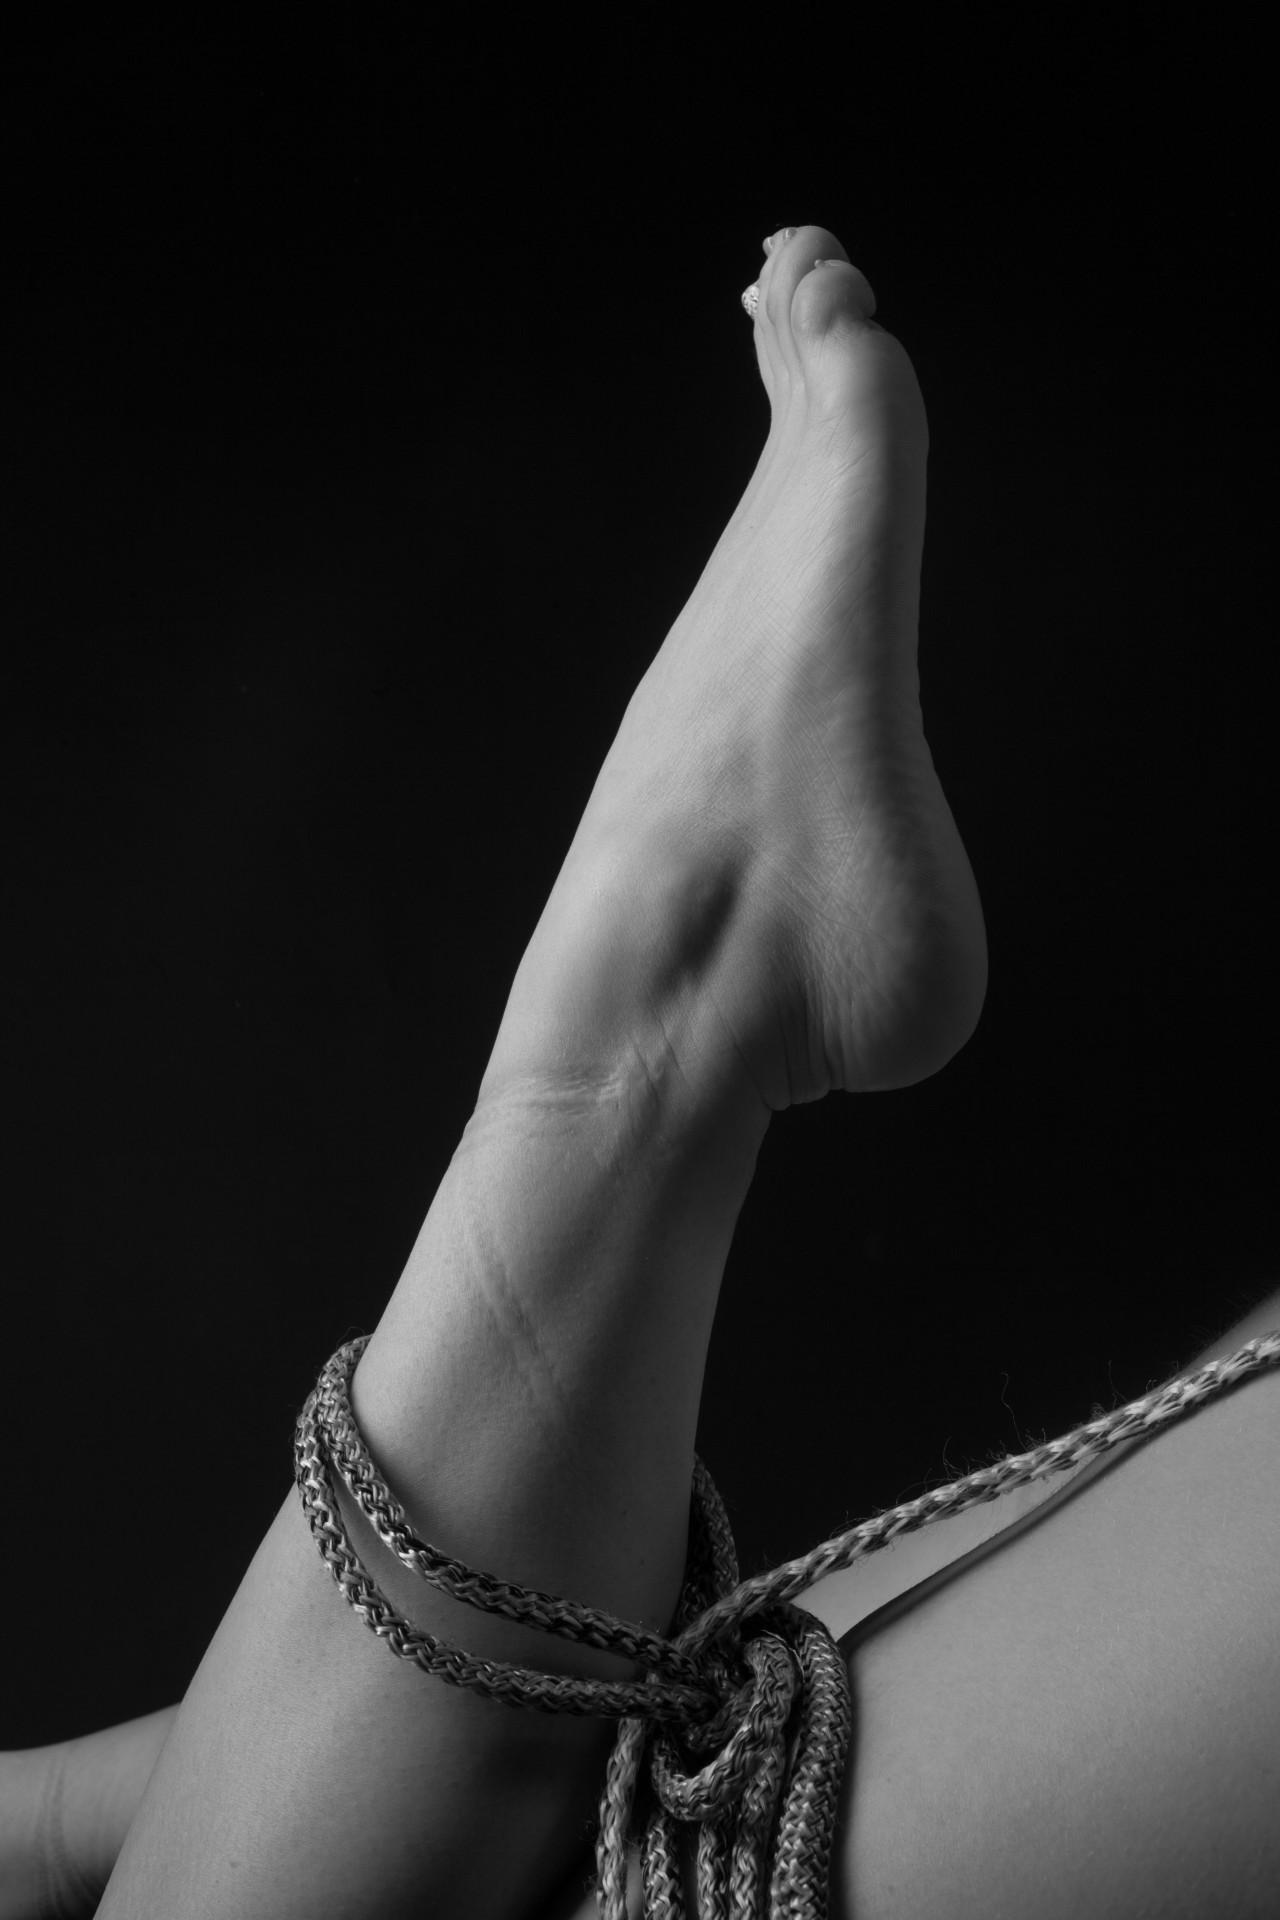 садо-мазо секс наказания